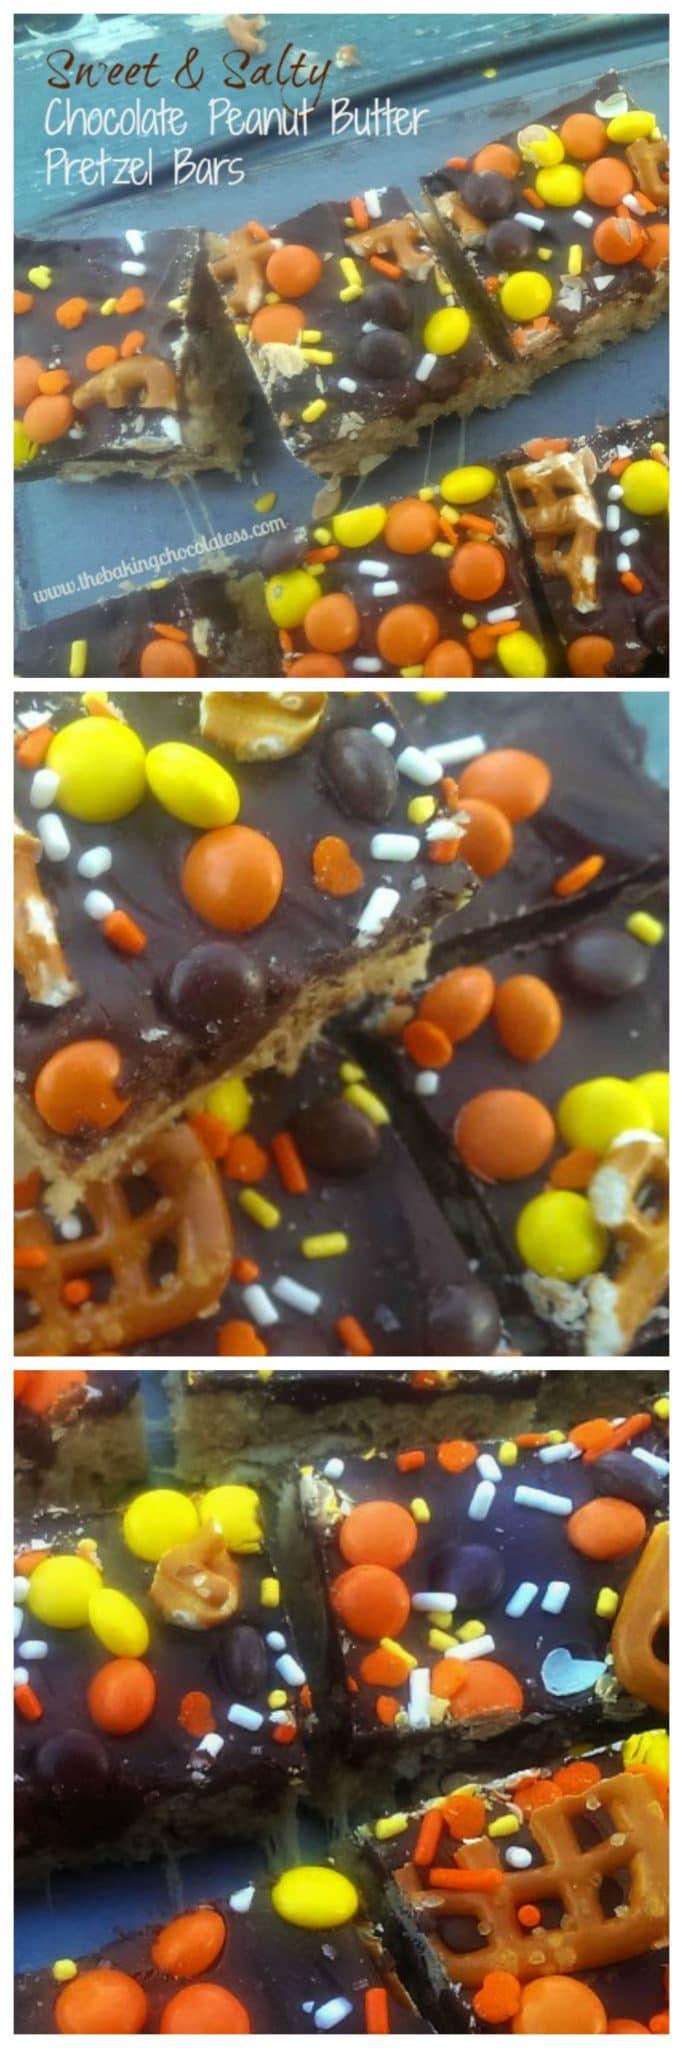 Sweet & Salty Chocolate Peanut Butter Pretzel Bars